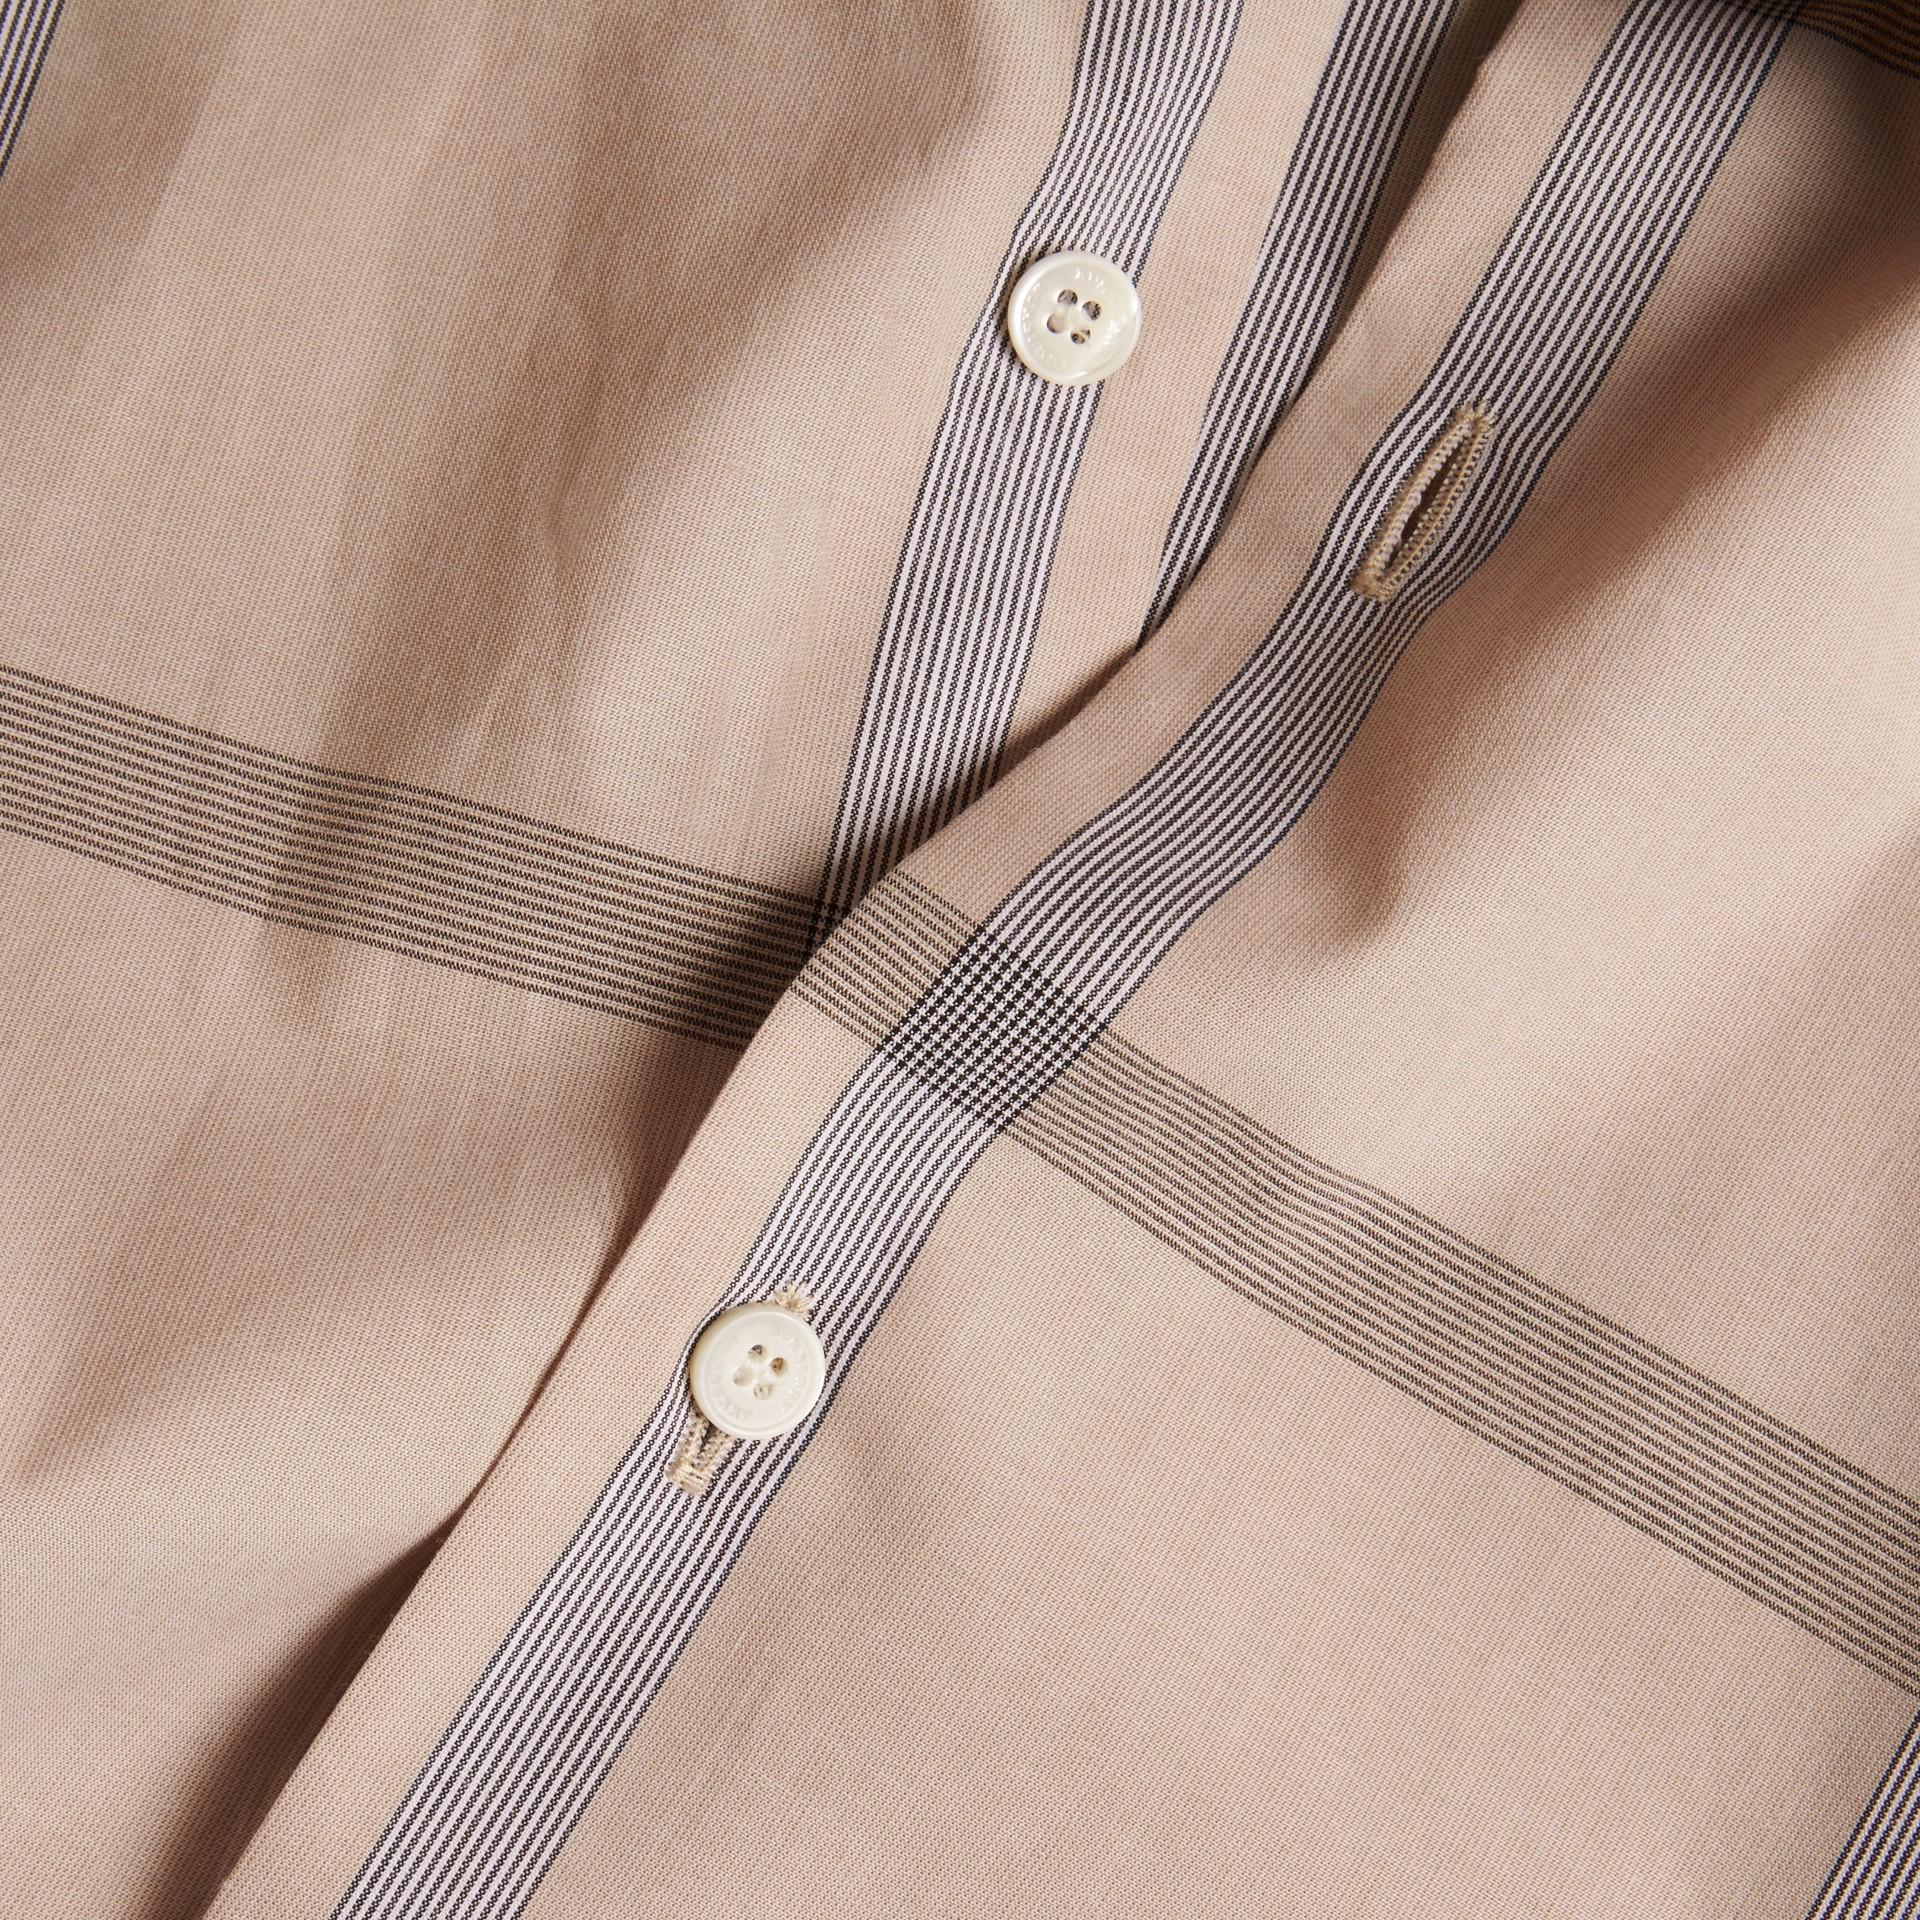 Light camel Short-sleeved Check Cotton Shirt Light Camel - gallery image 2